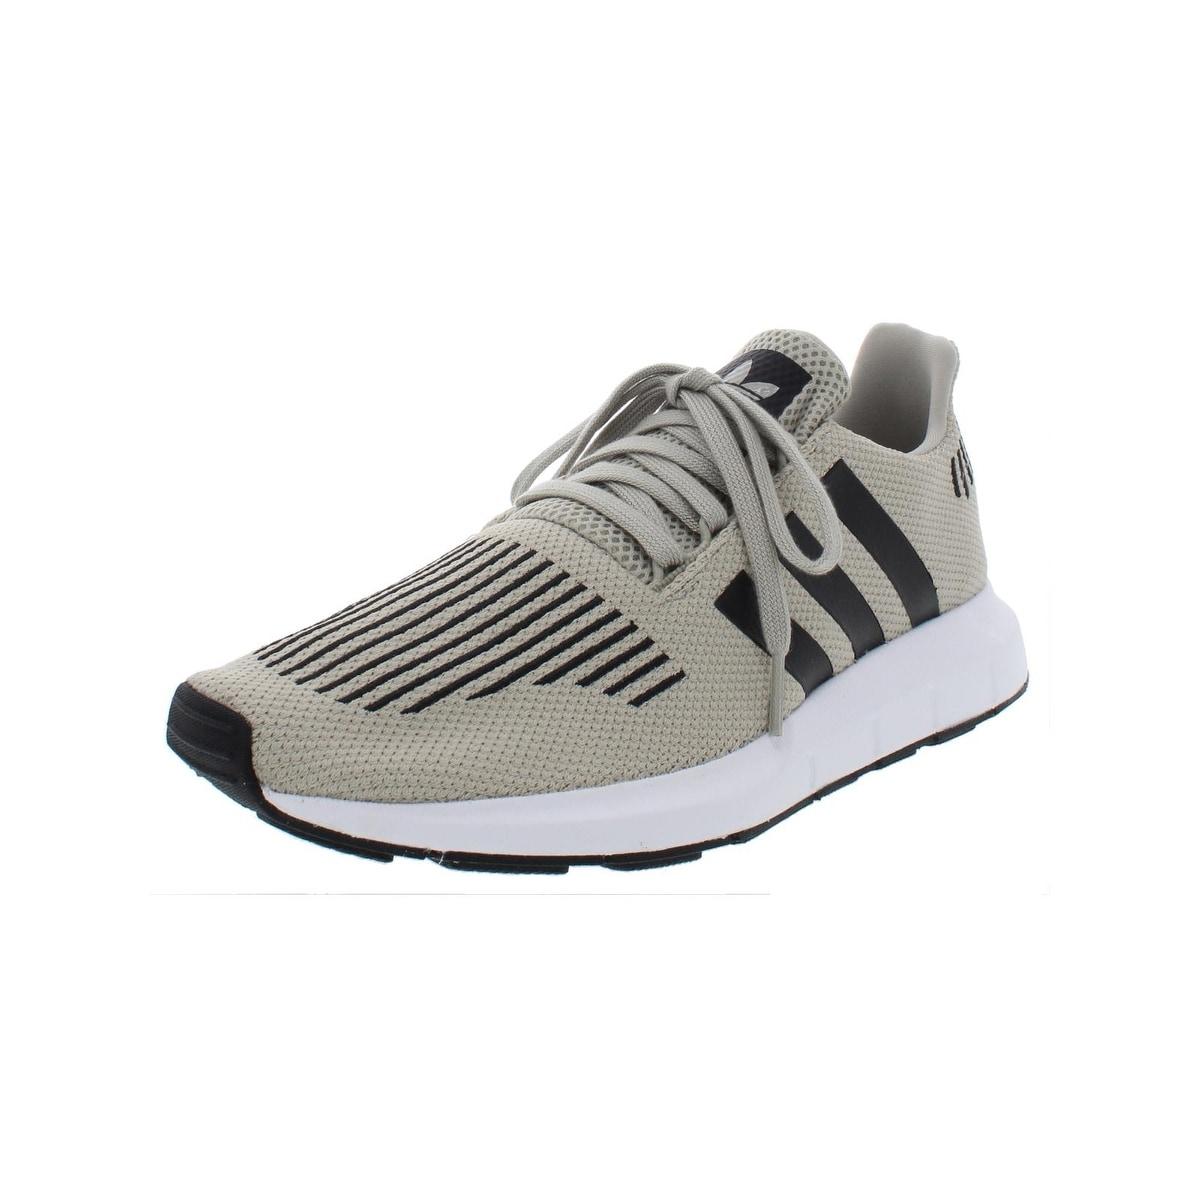 men's adidas swift run athletic shoe